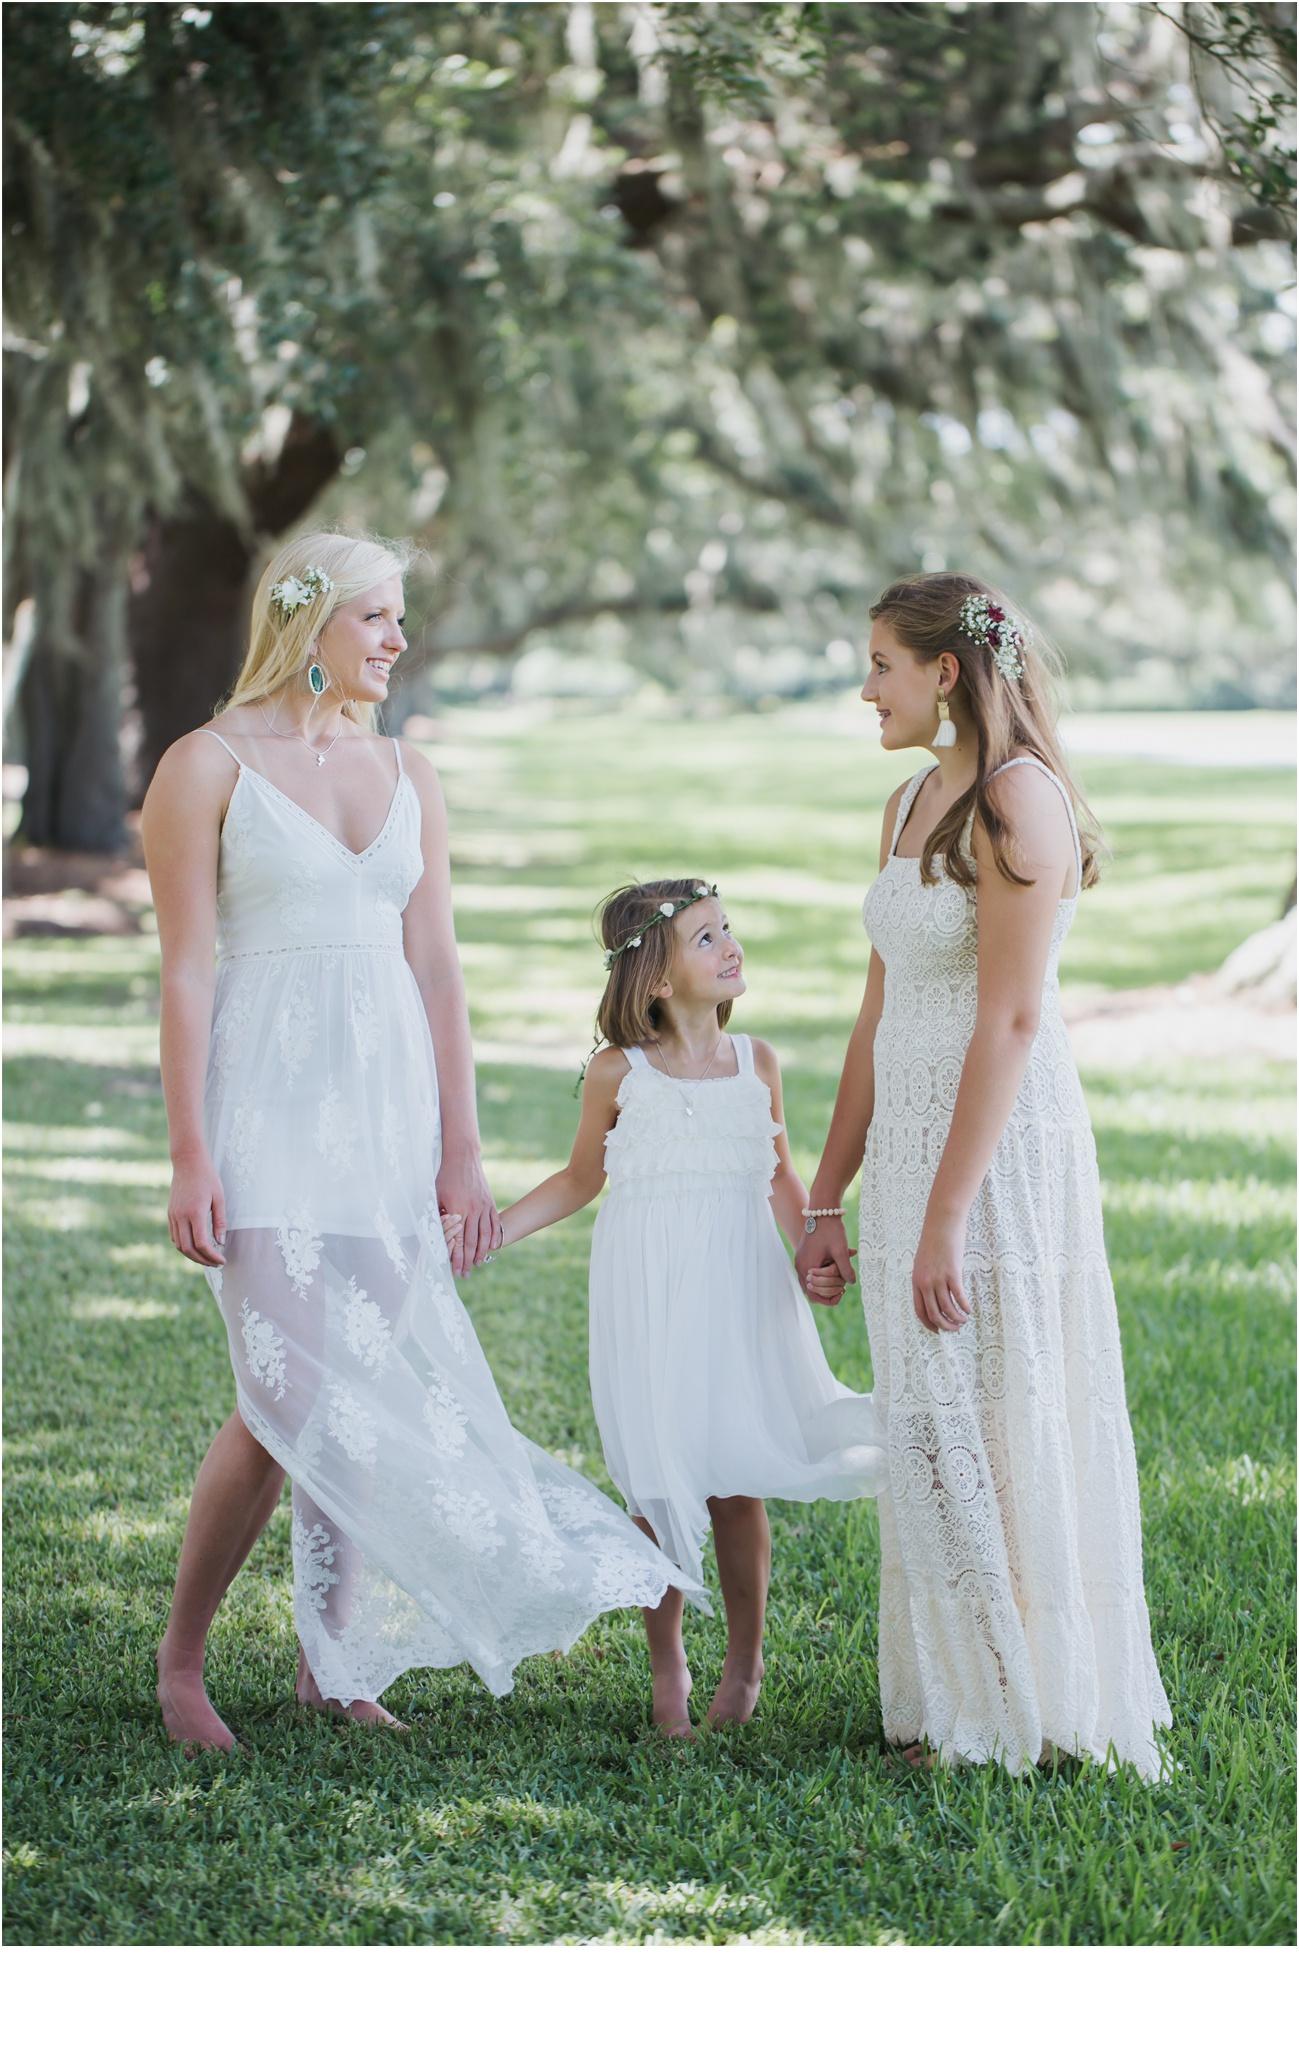 Rainey_Gregg_Photography_St._Simons_Island_Georgia_California_Wedding_Portrait_Photography_1105.jpg